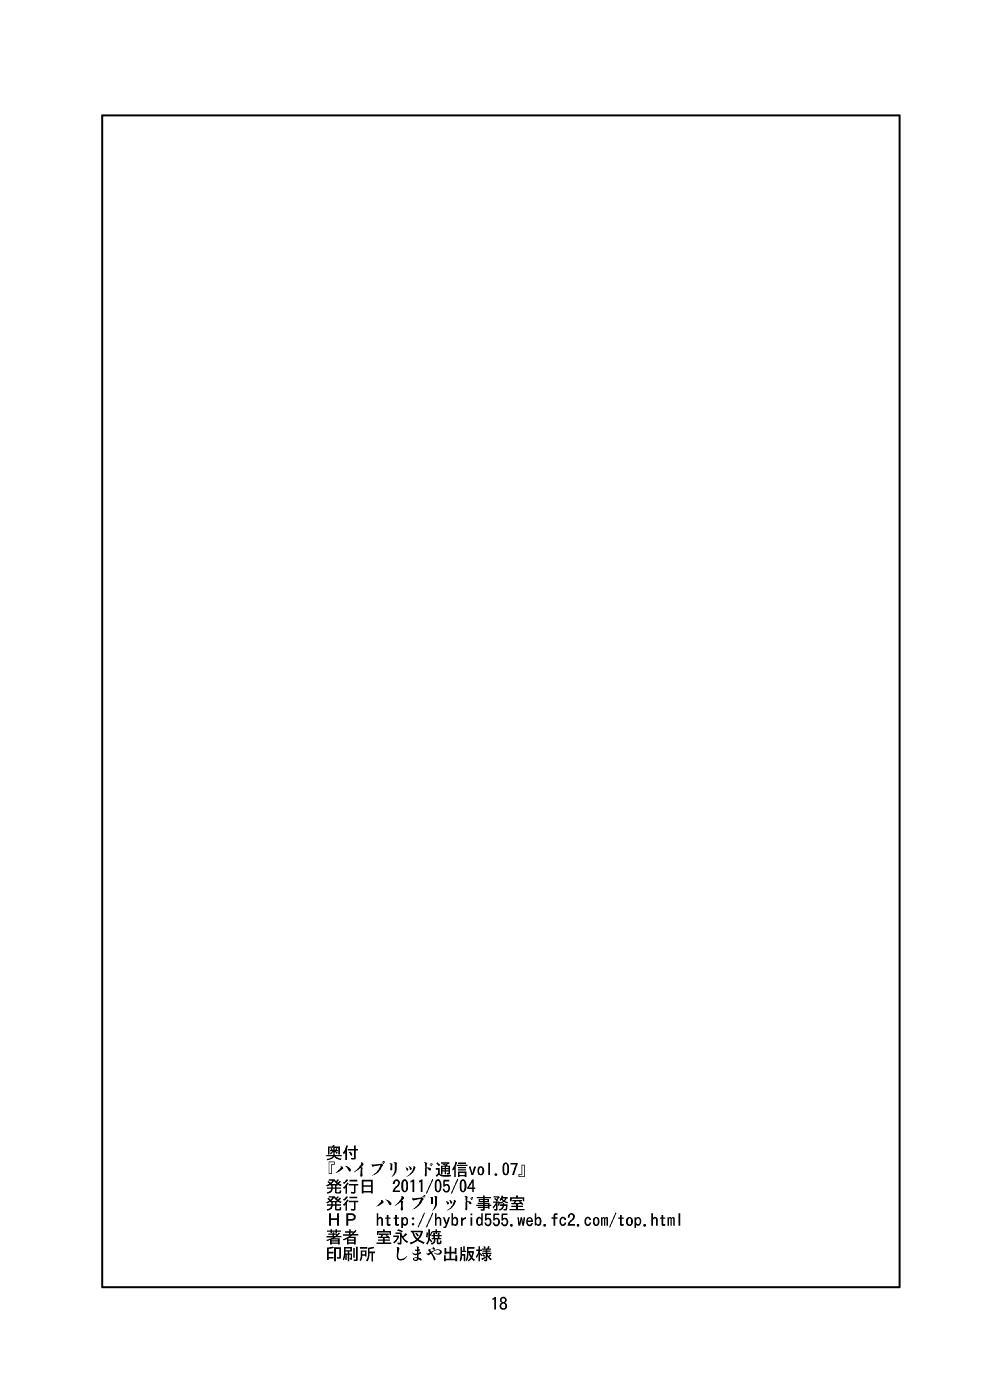 Hybrid Tsuushin Vol.07 16